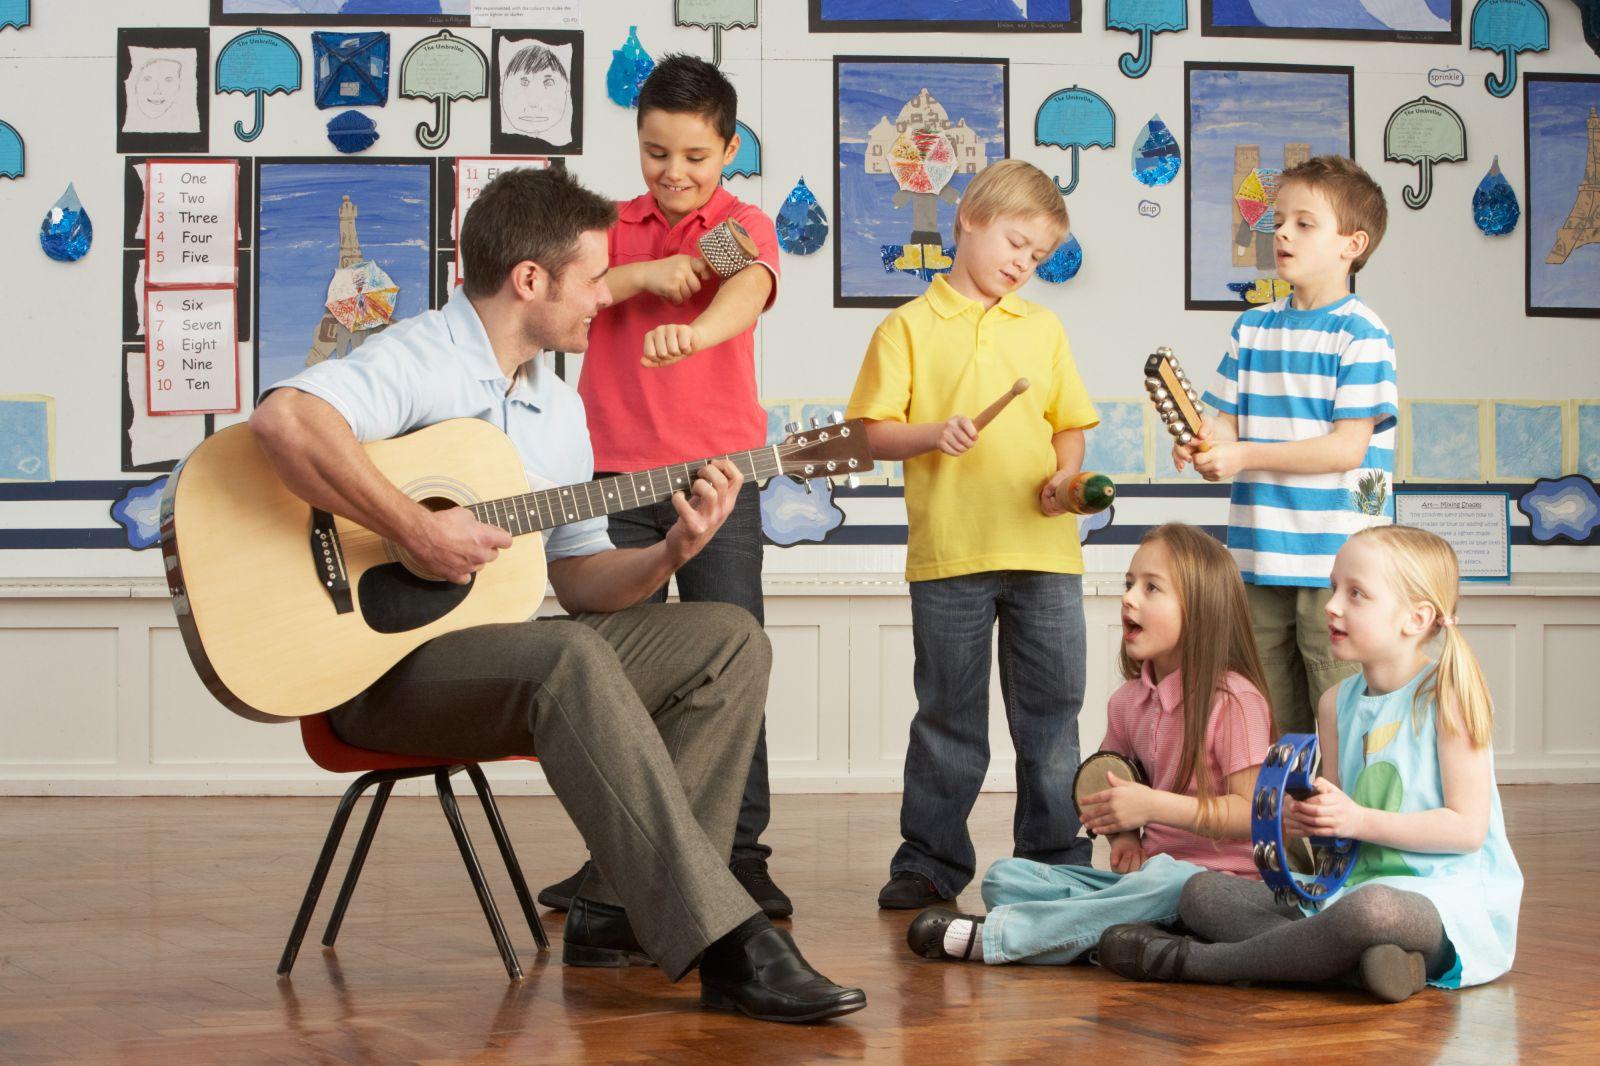 child childrens music school - HD1200×800